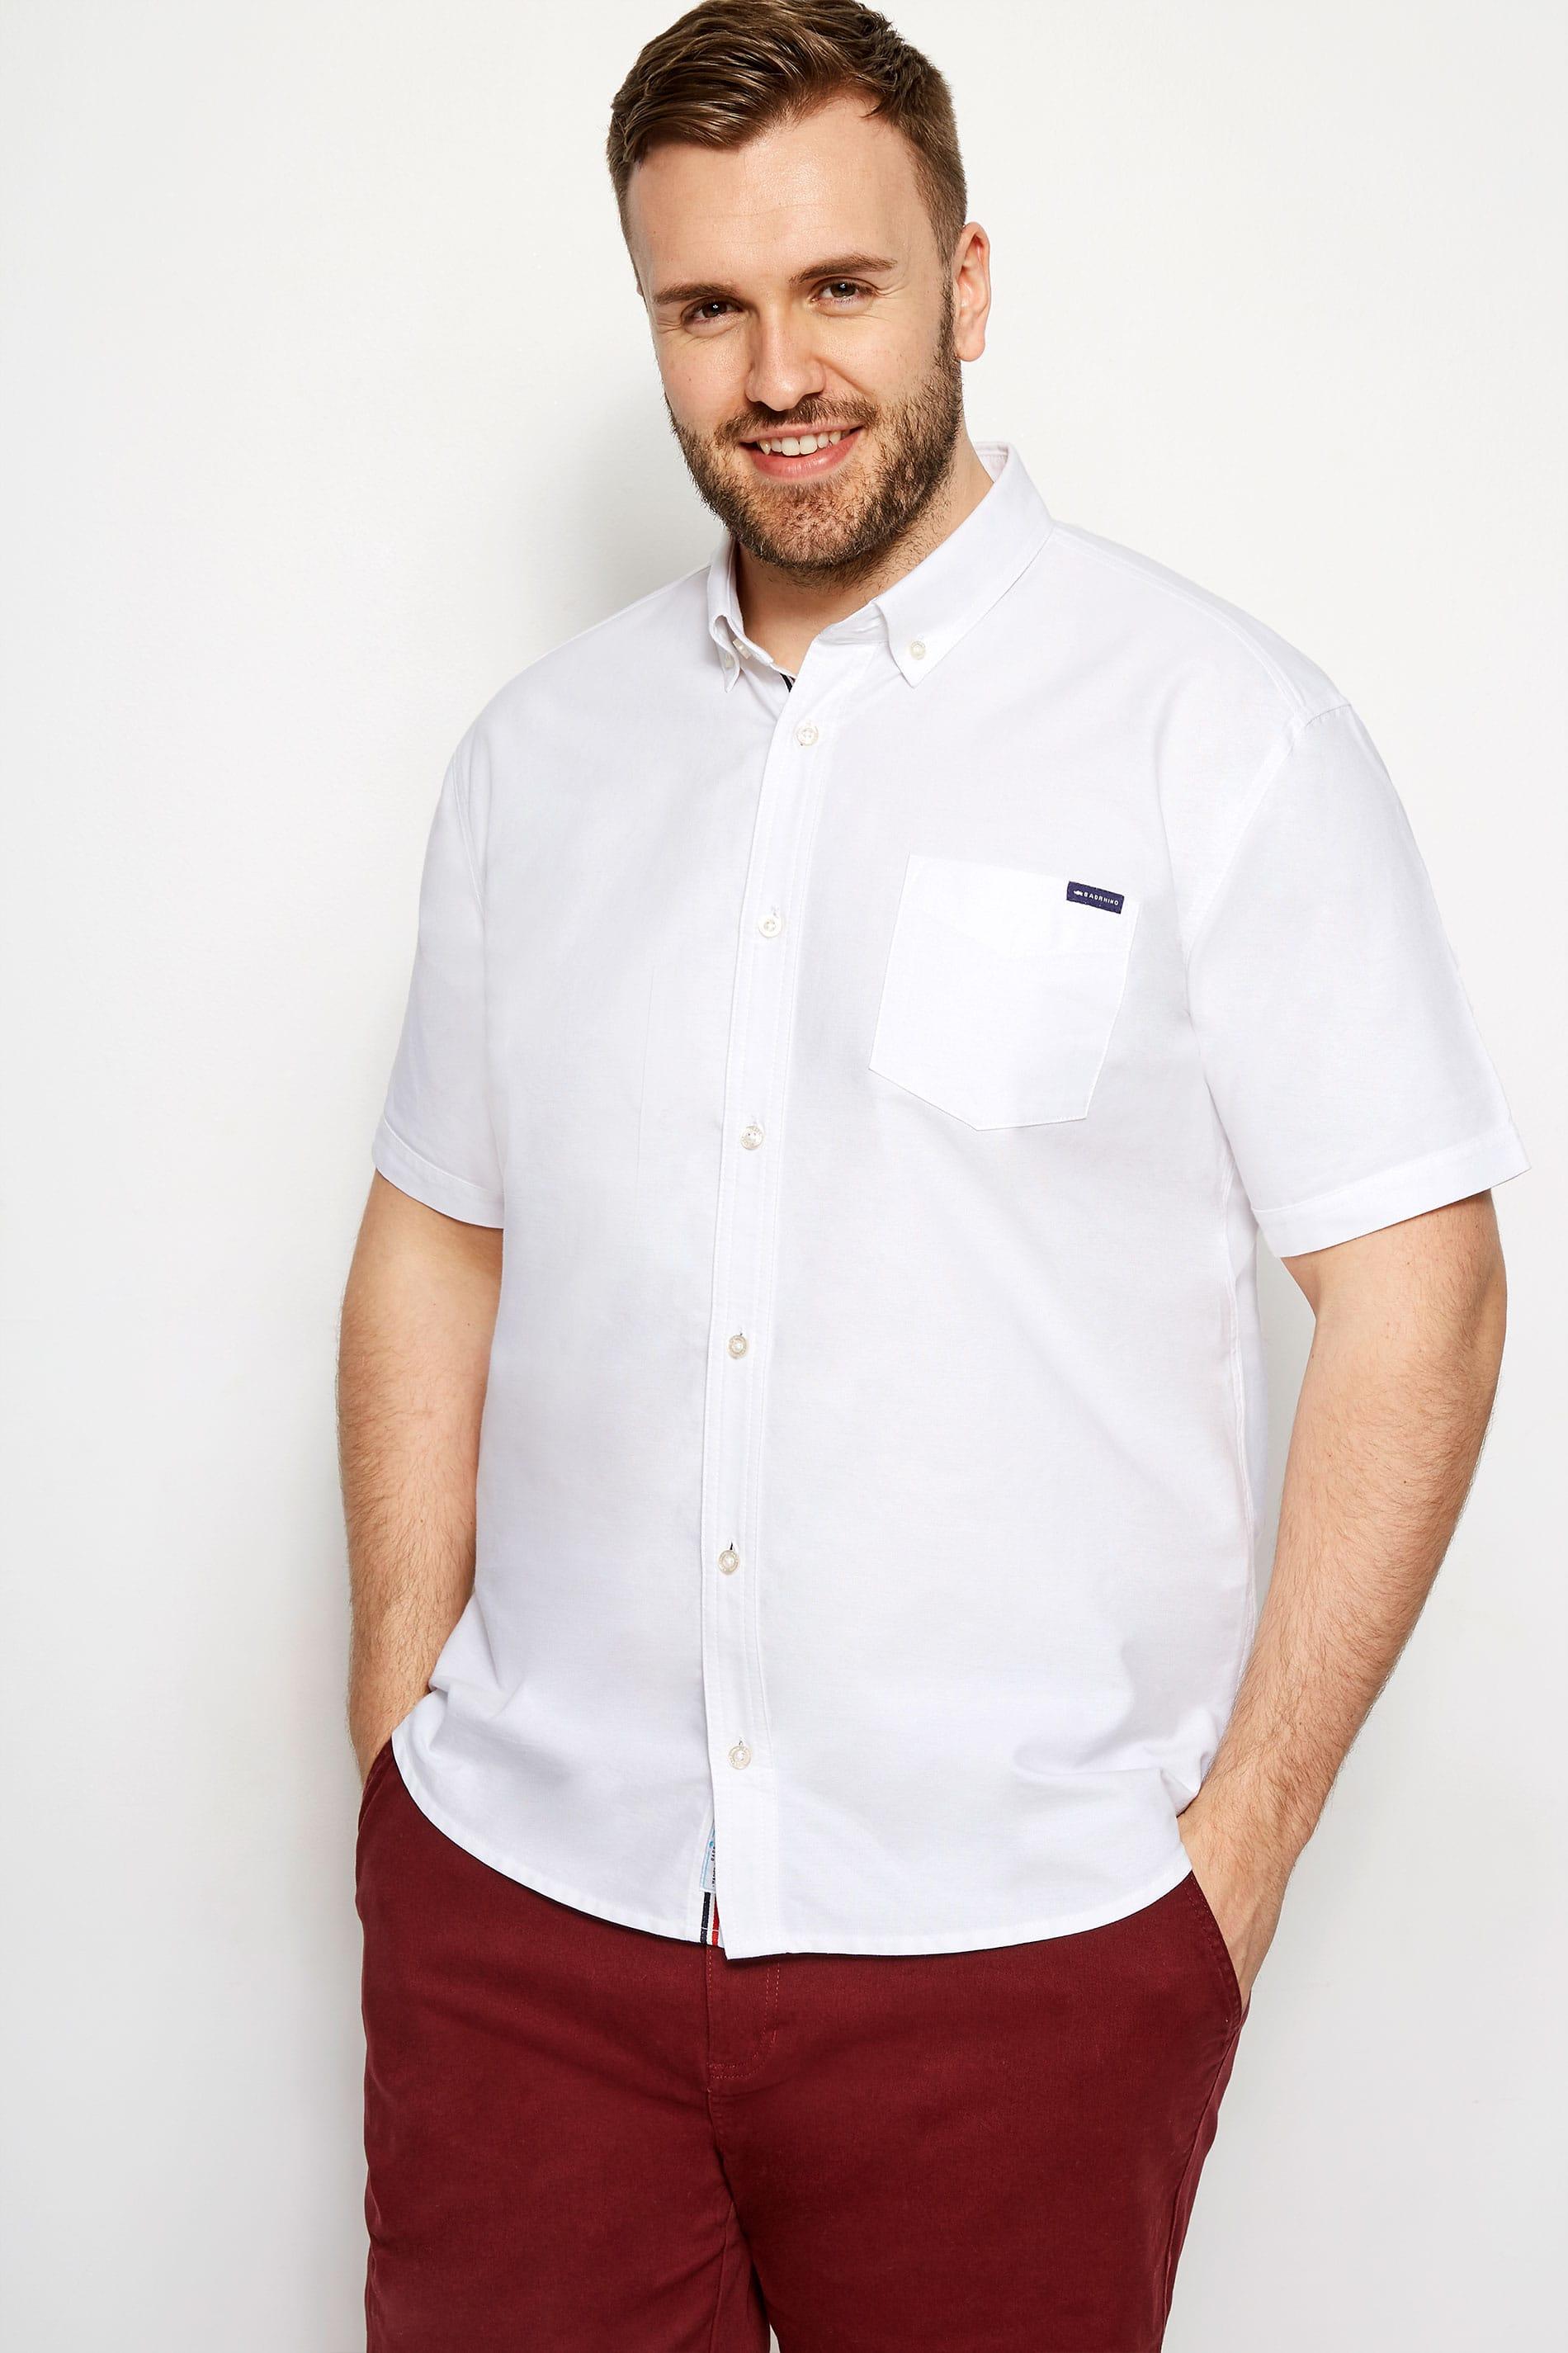 BadRhino White Cotton Short Sleeved Oxford Shirt